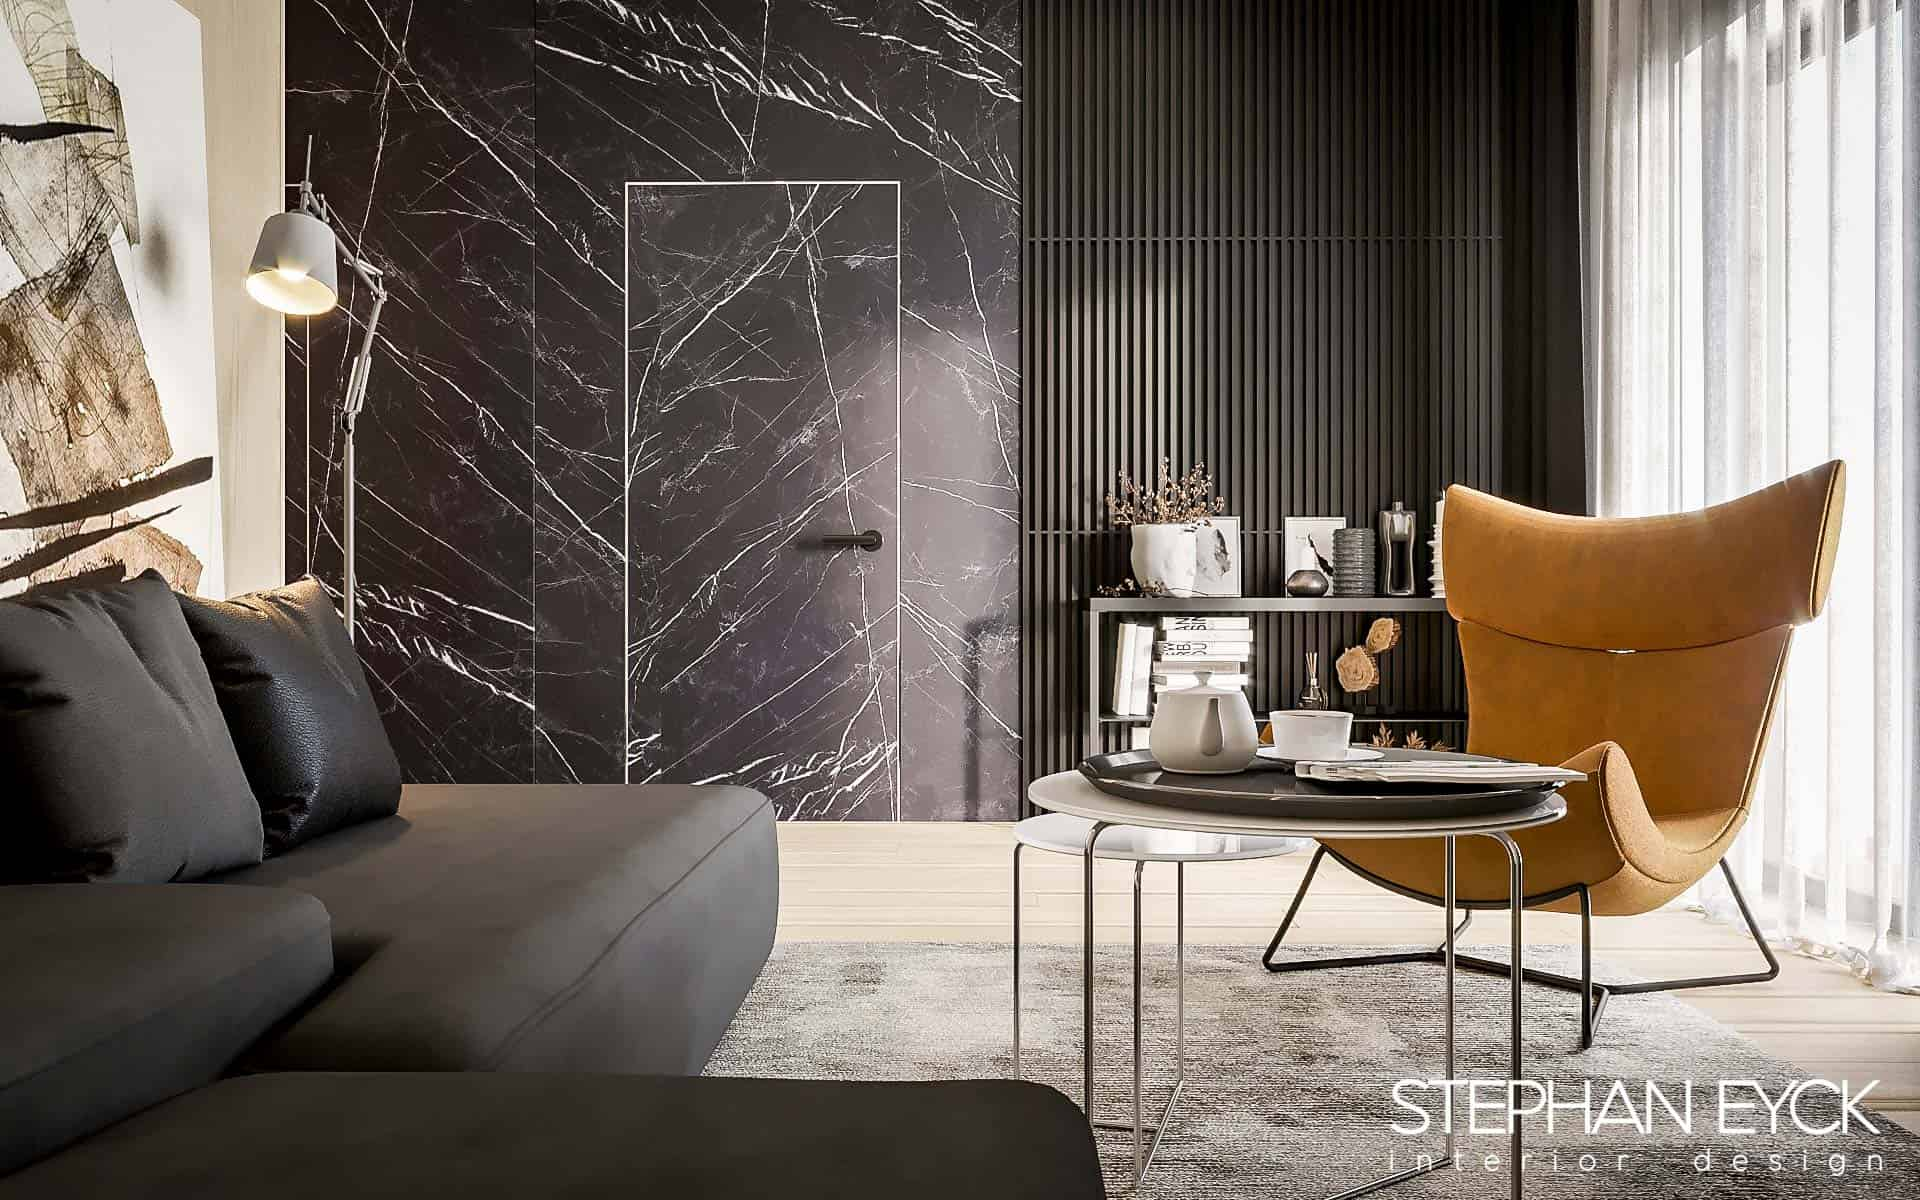 interior livingroom 03 Stephan Eyck